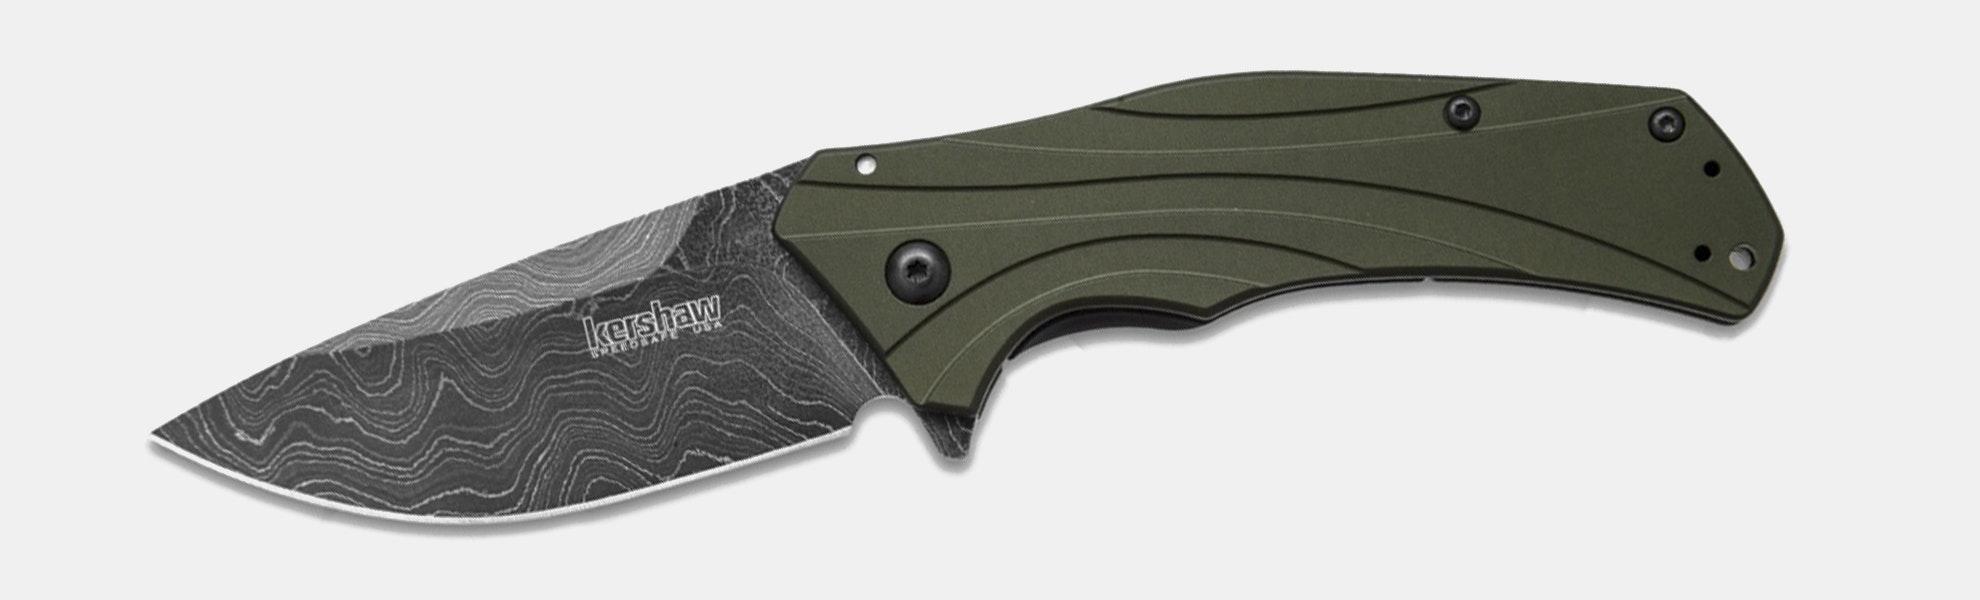 Kershaw Knockout Damascus A/O Knife